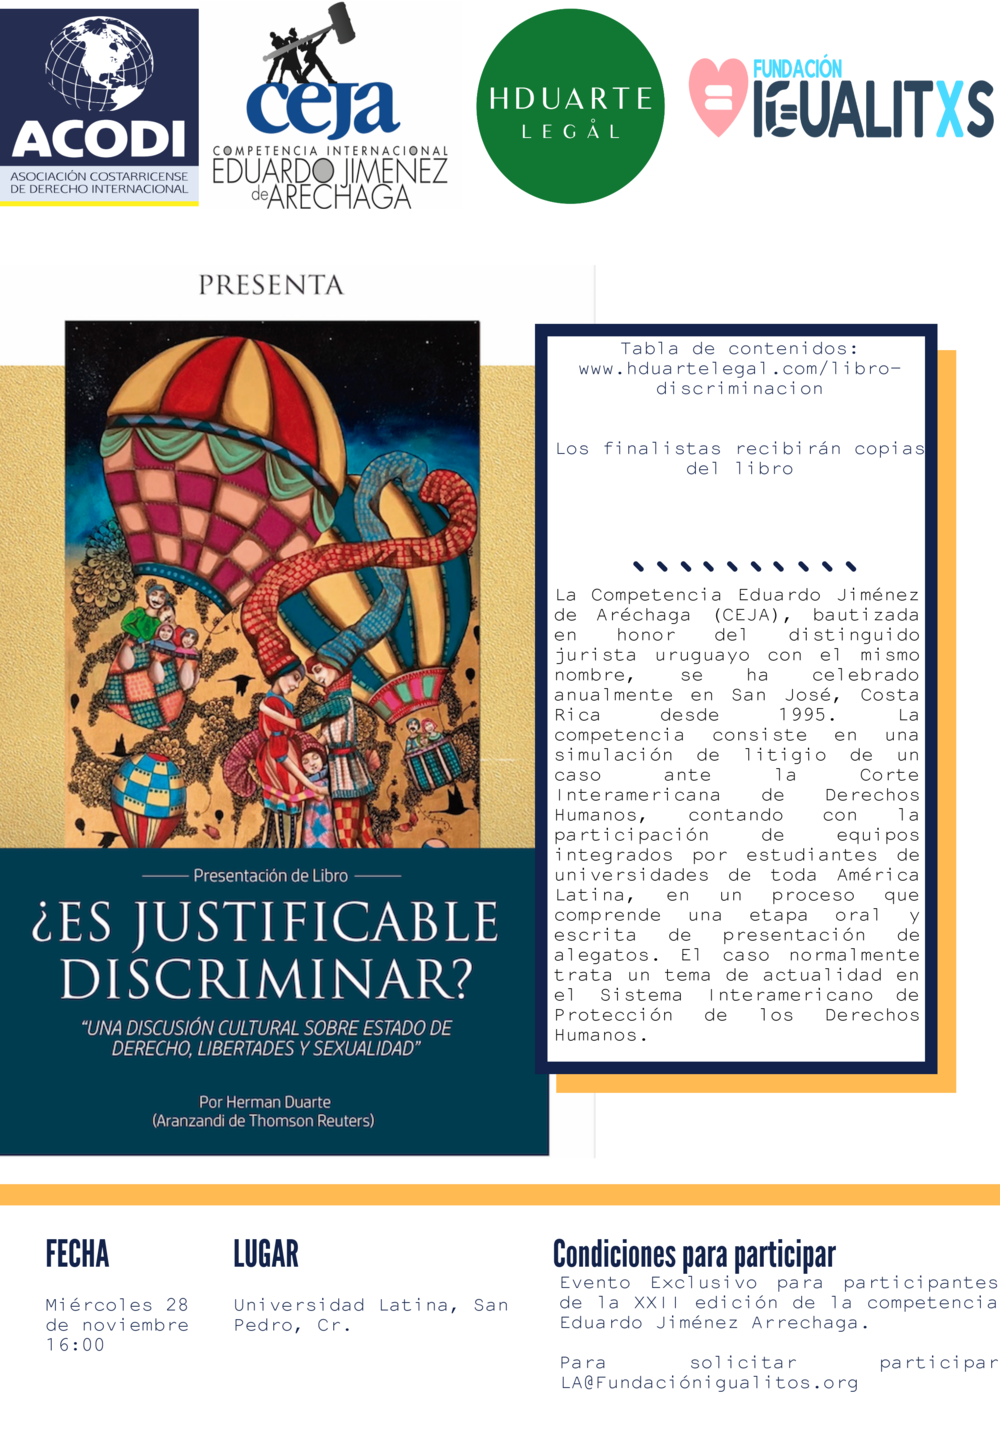 Competencia-Jimenez-Arrechaga-Acodi-Costa-Rica-Herman-Duarte-Libro-Discriminacion-Fundacion-Igualitos-Hduarte-Legal-Ulatina-San-Pedro